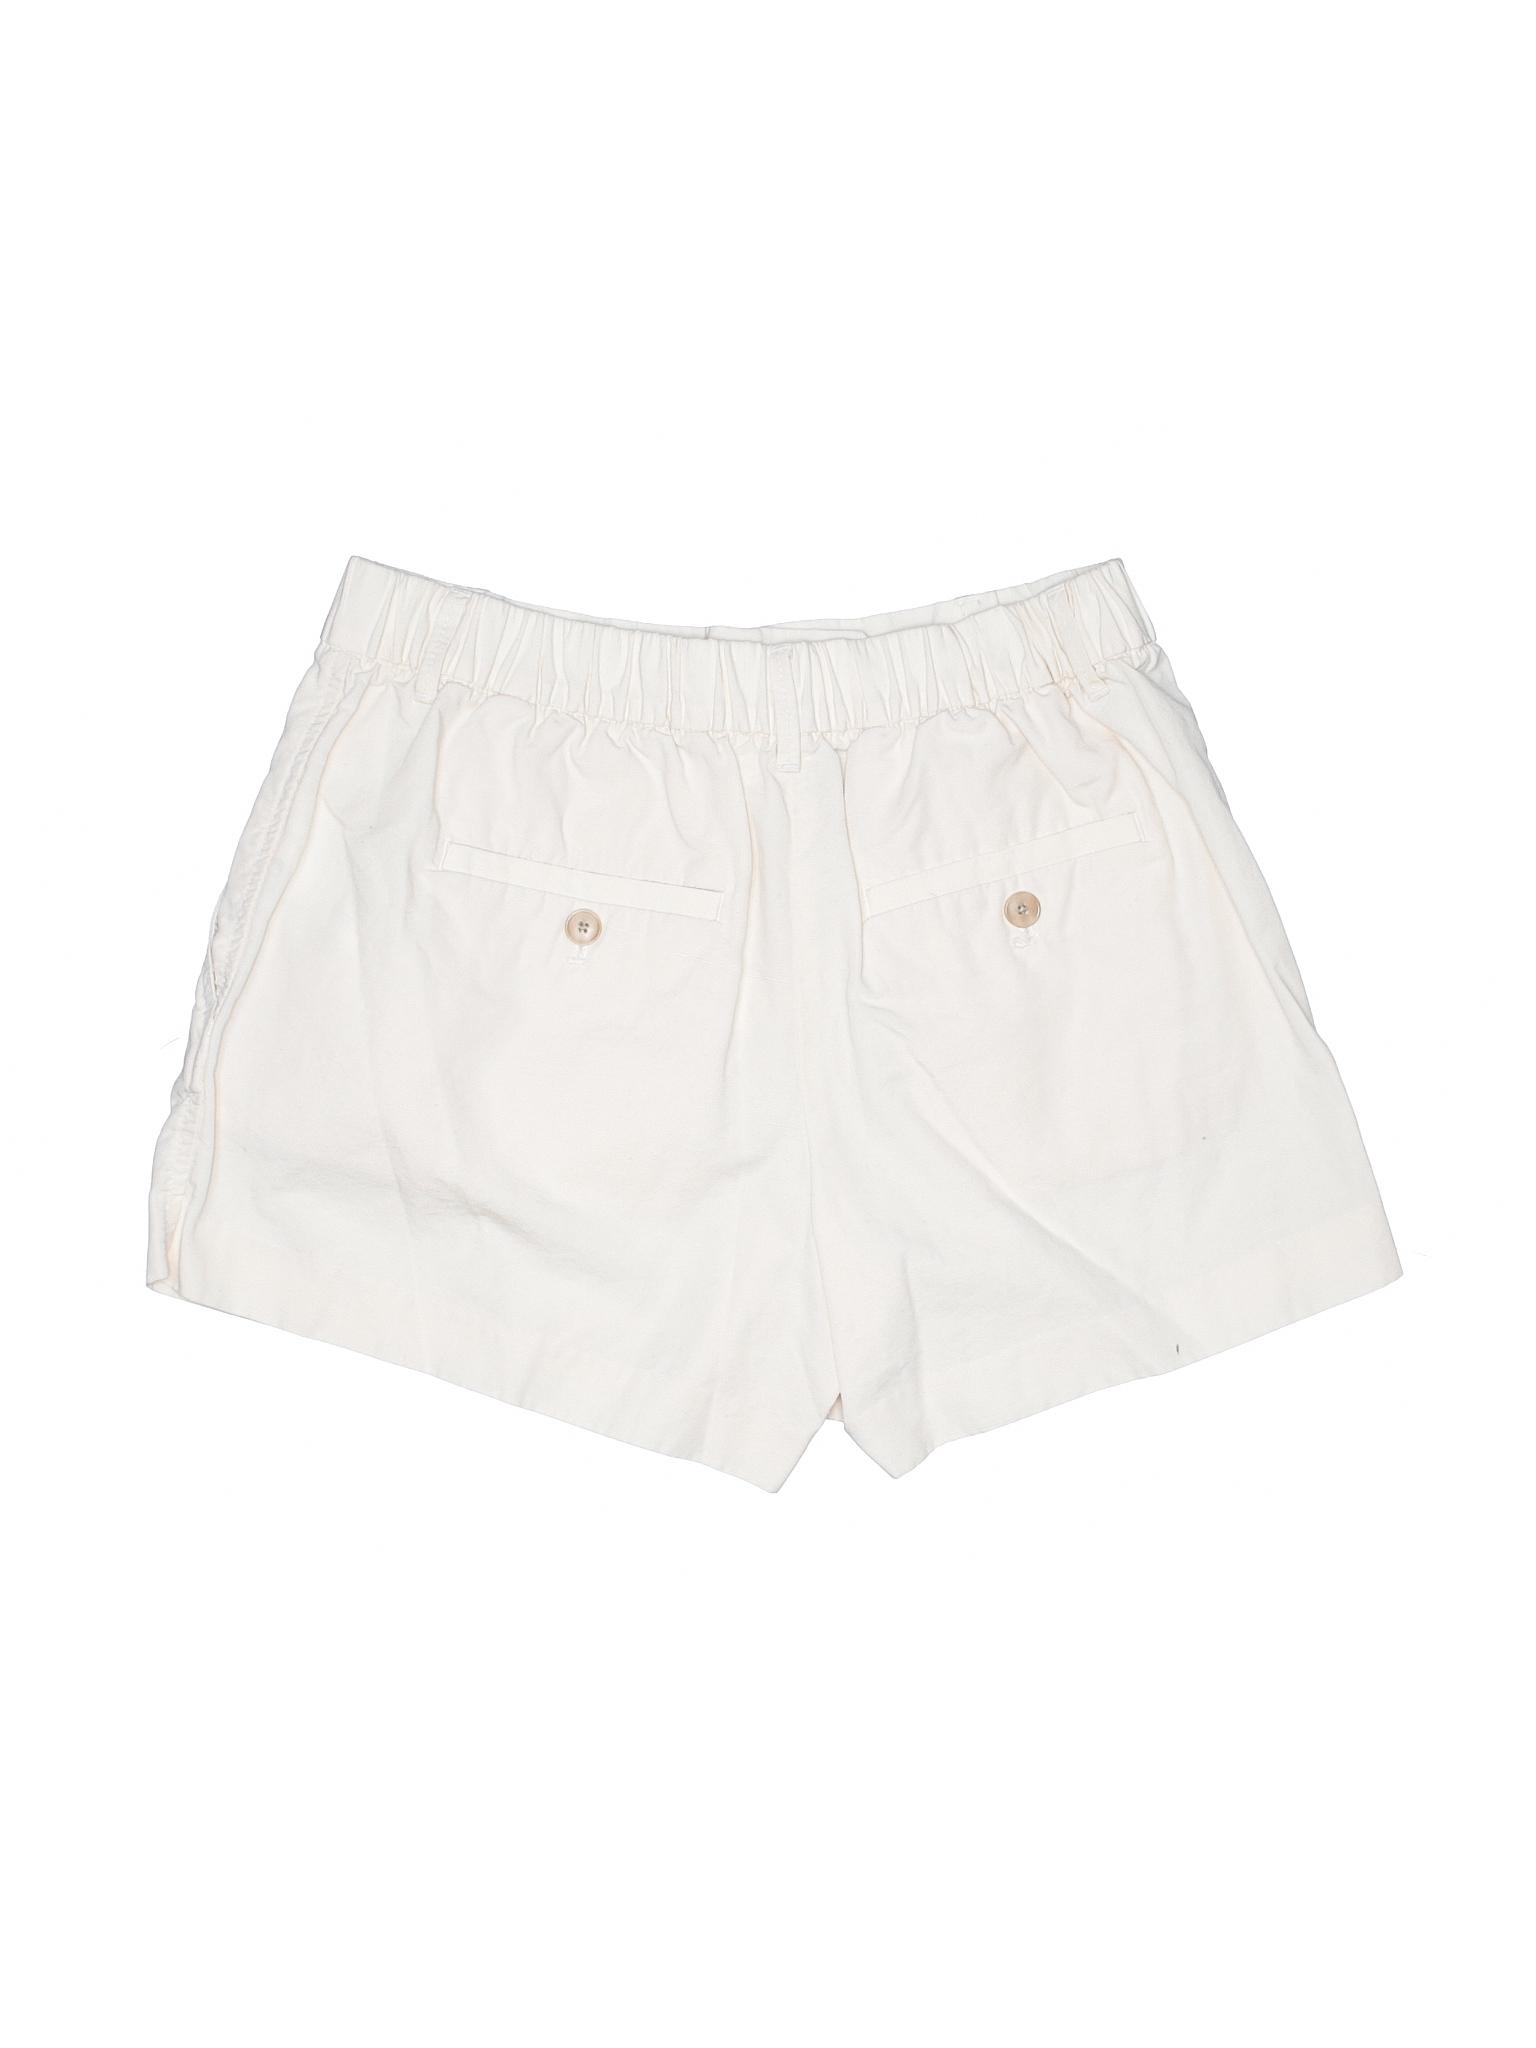 Shorts Gap Boutique Boutique Gap Khaki xf6wP5Iq